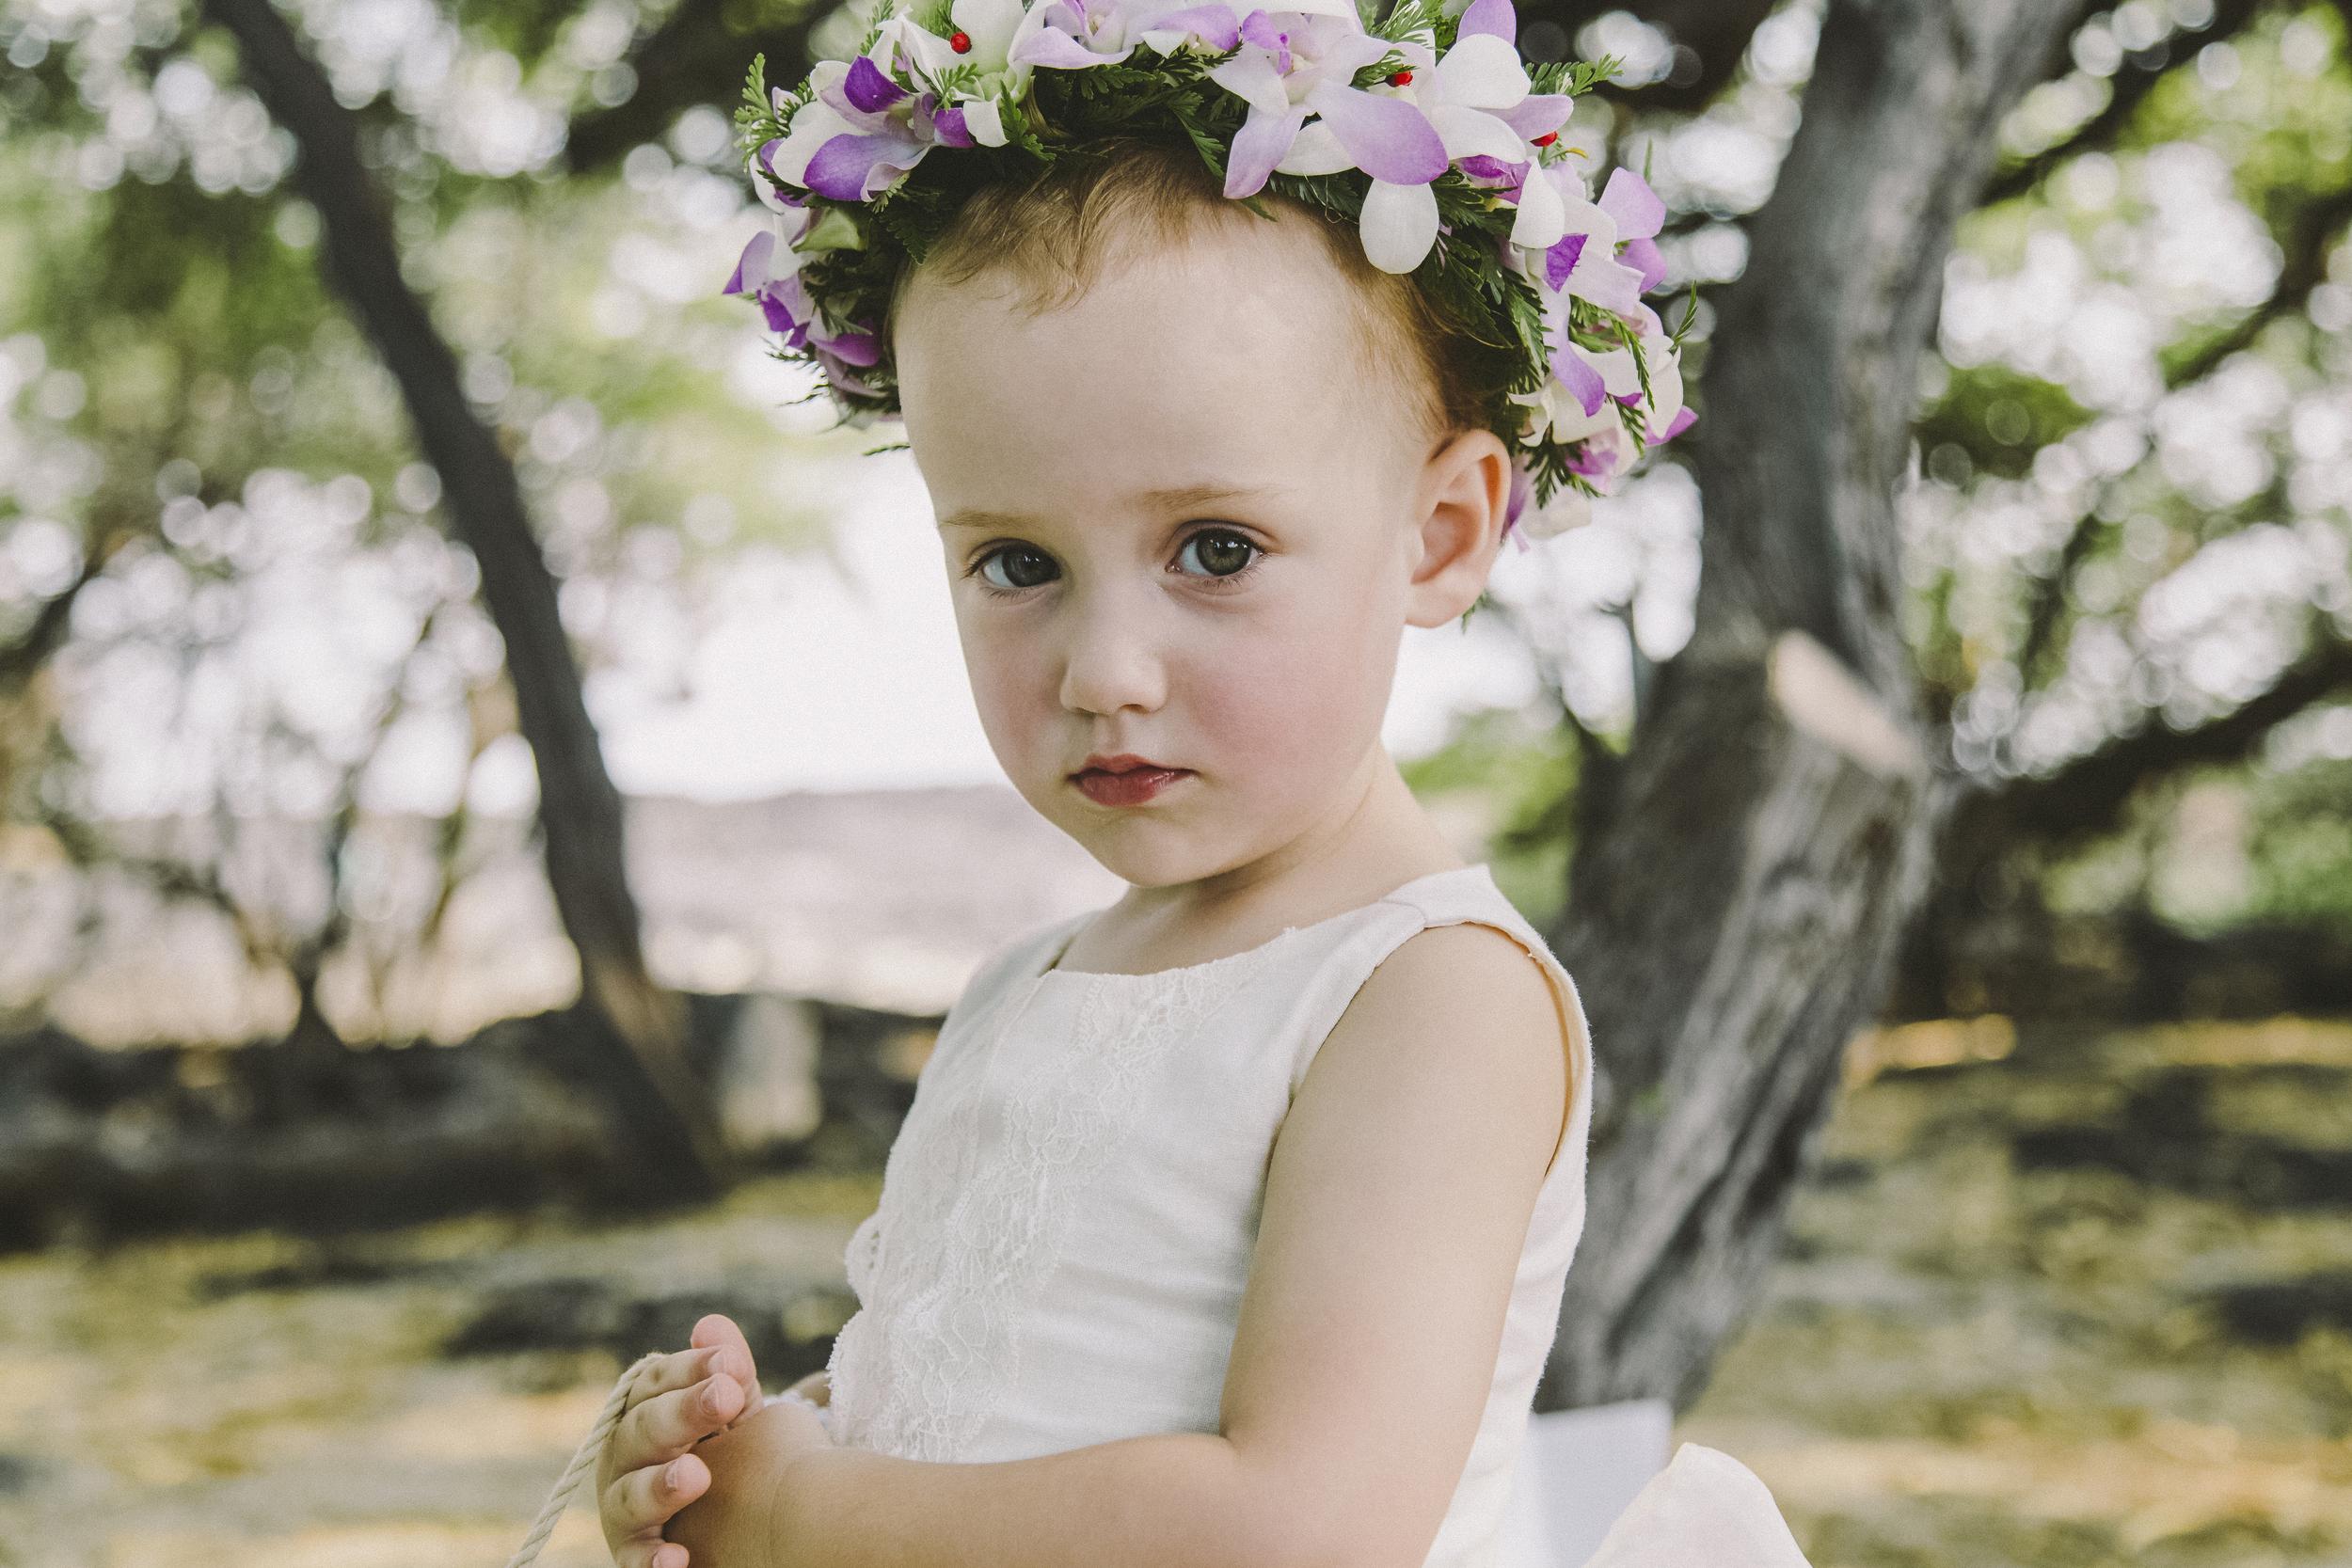 angie-diaz-photography-hawaii-wedding-photographer-kelli-jay-43.jpg